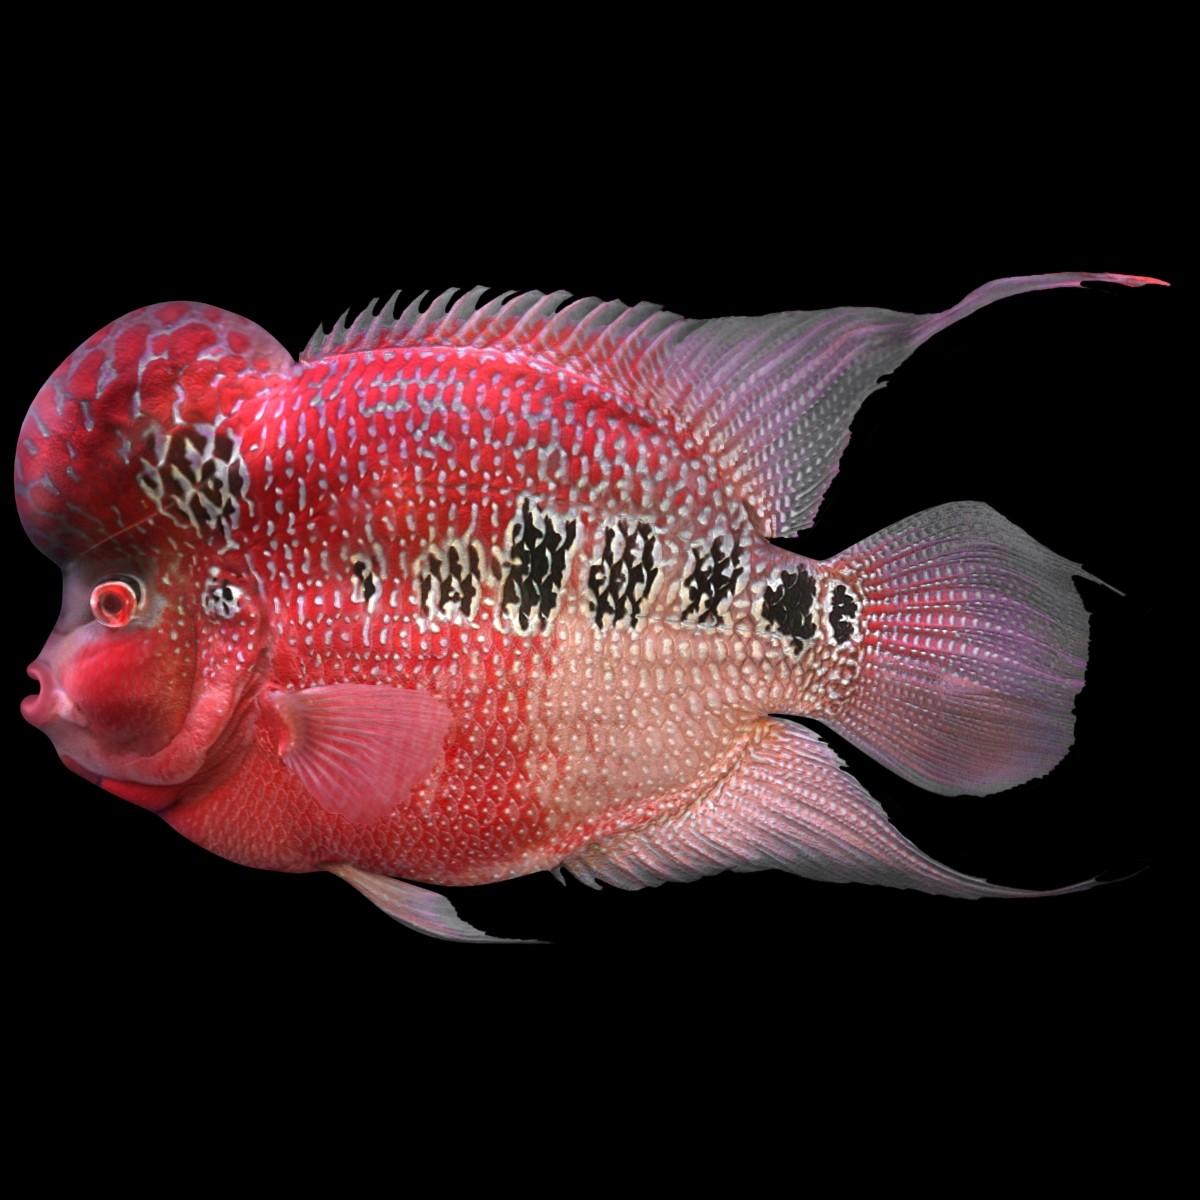 flowerhorn fish 3d model